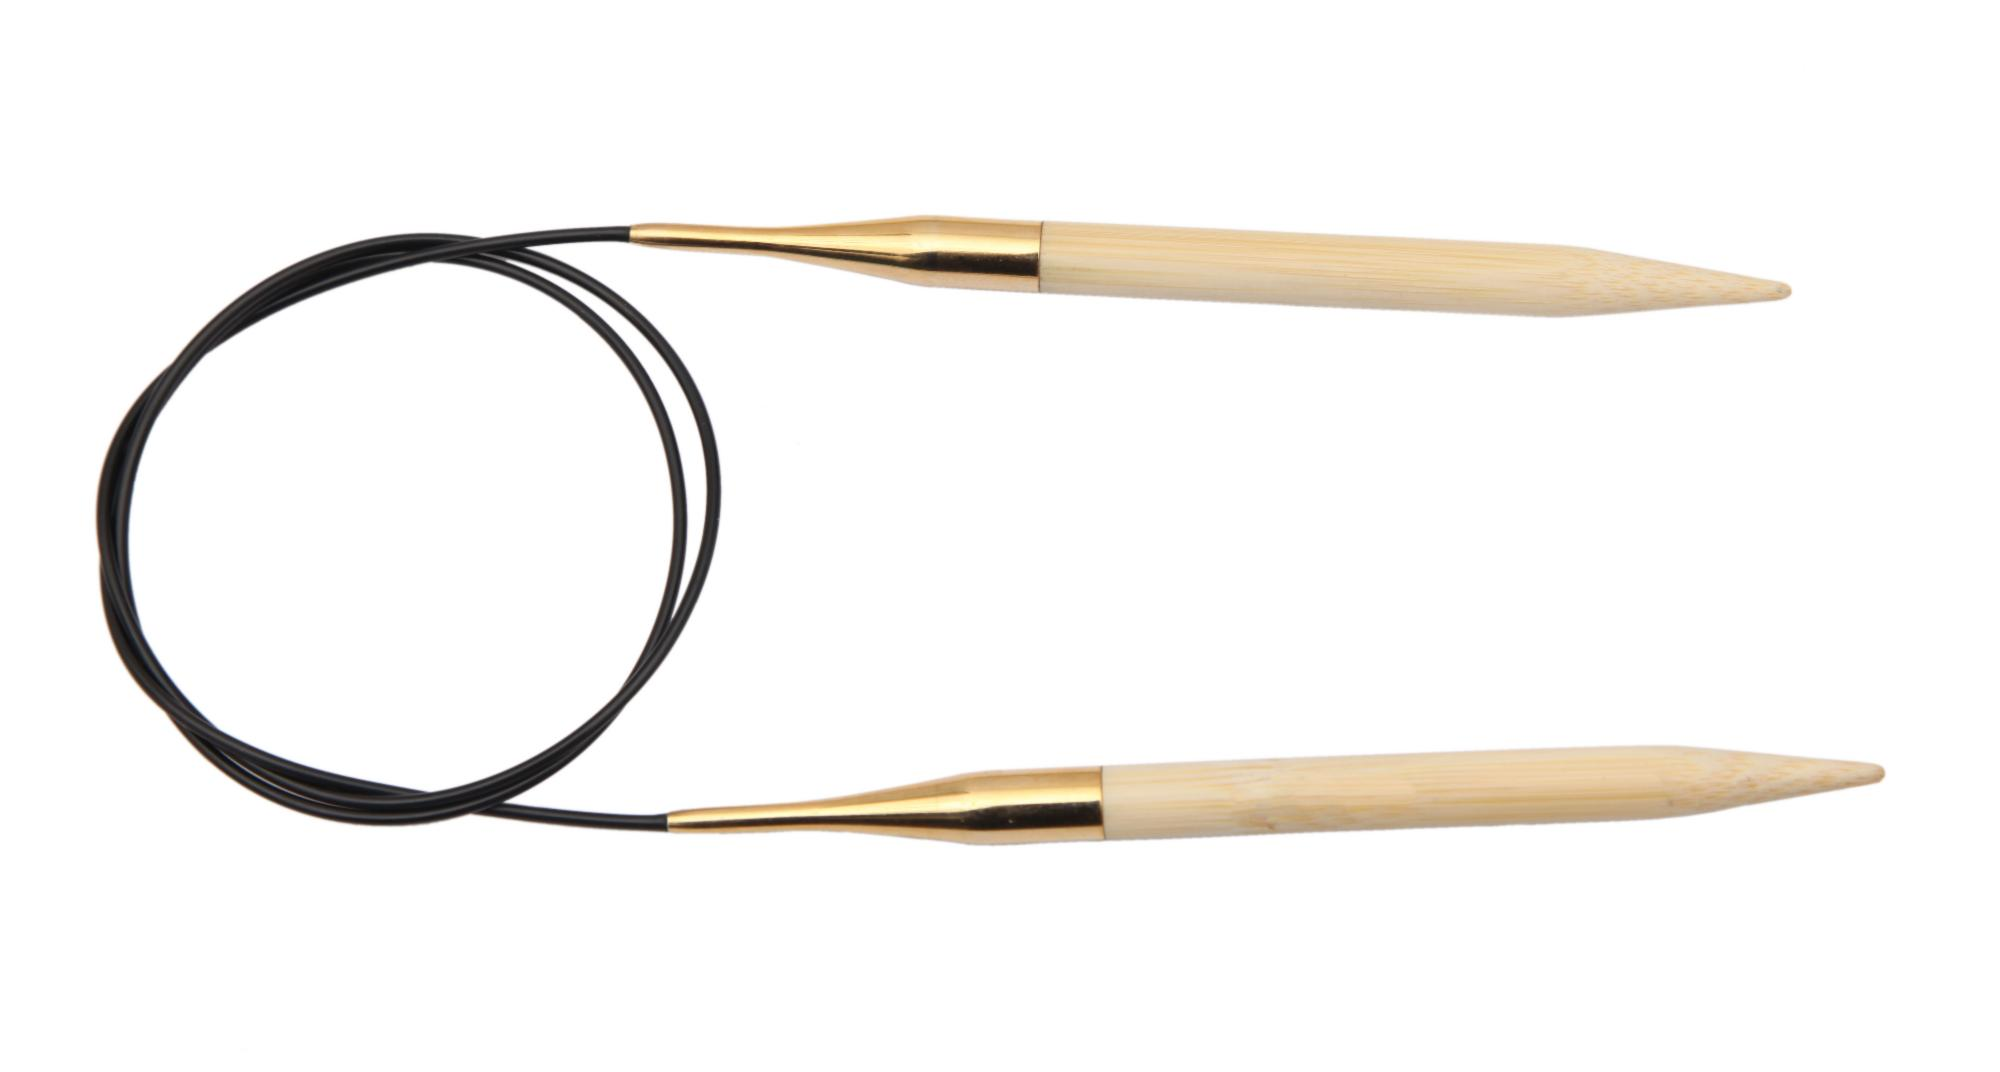 Спицы круговые 100 см Bamboo KnitPro, 22269, 5.00 мм